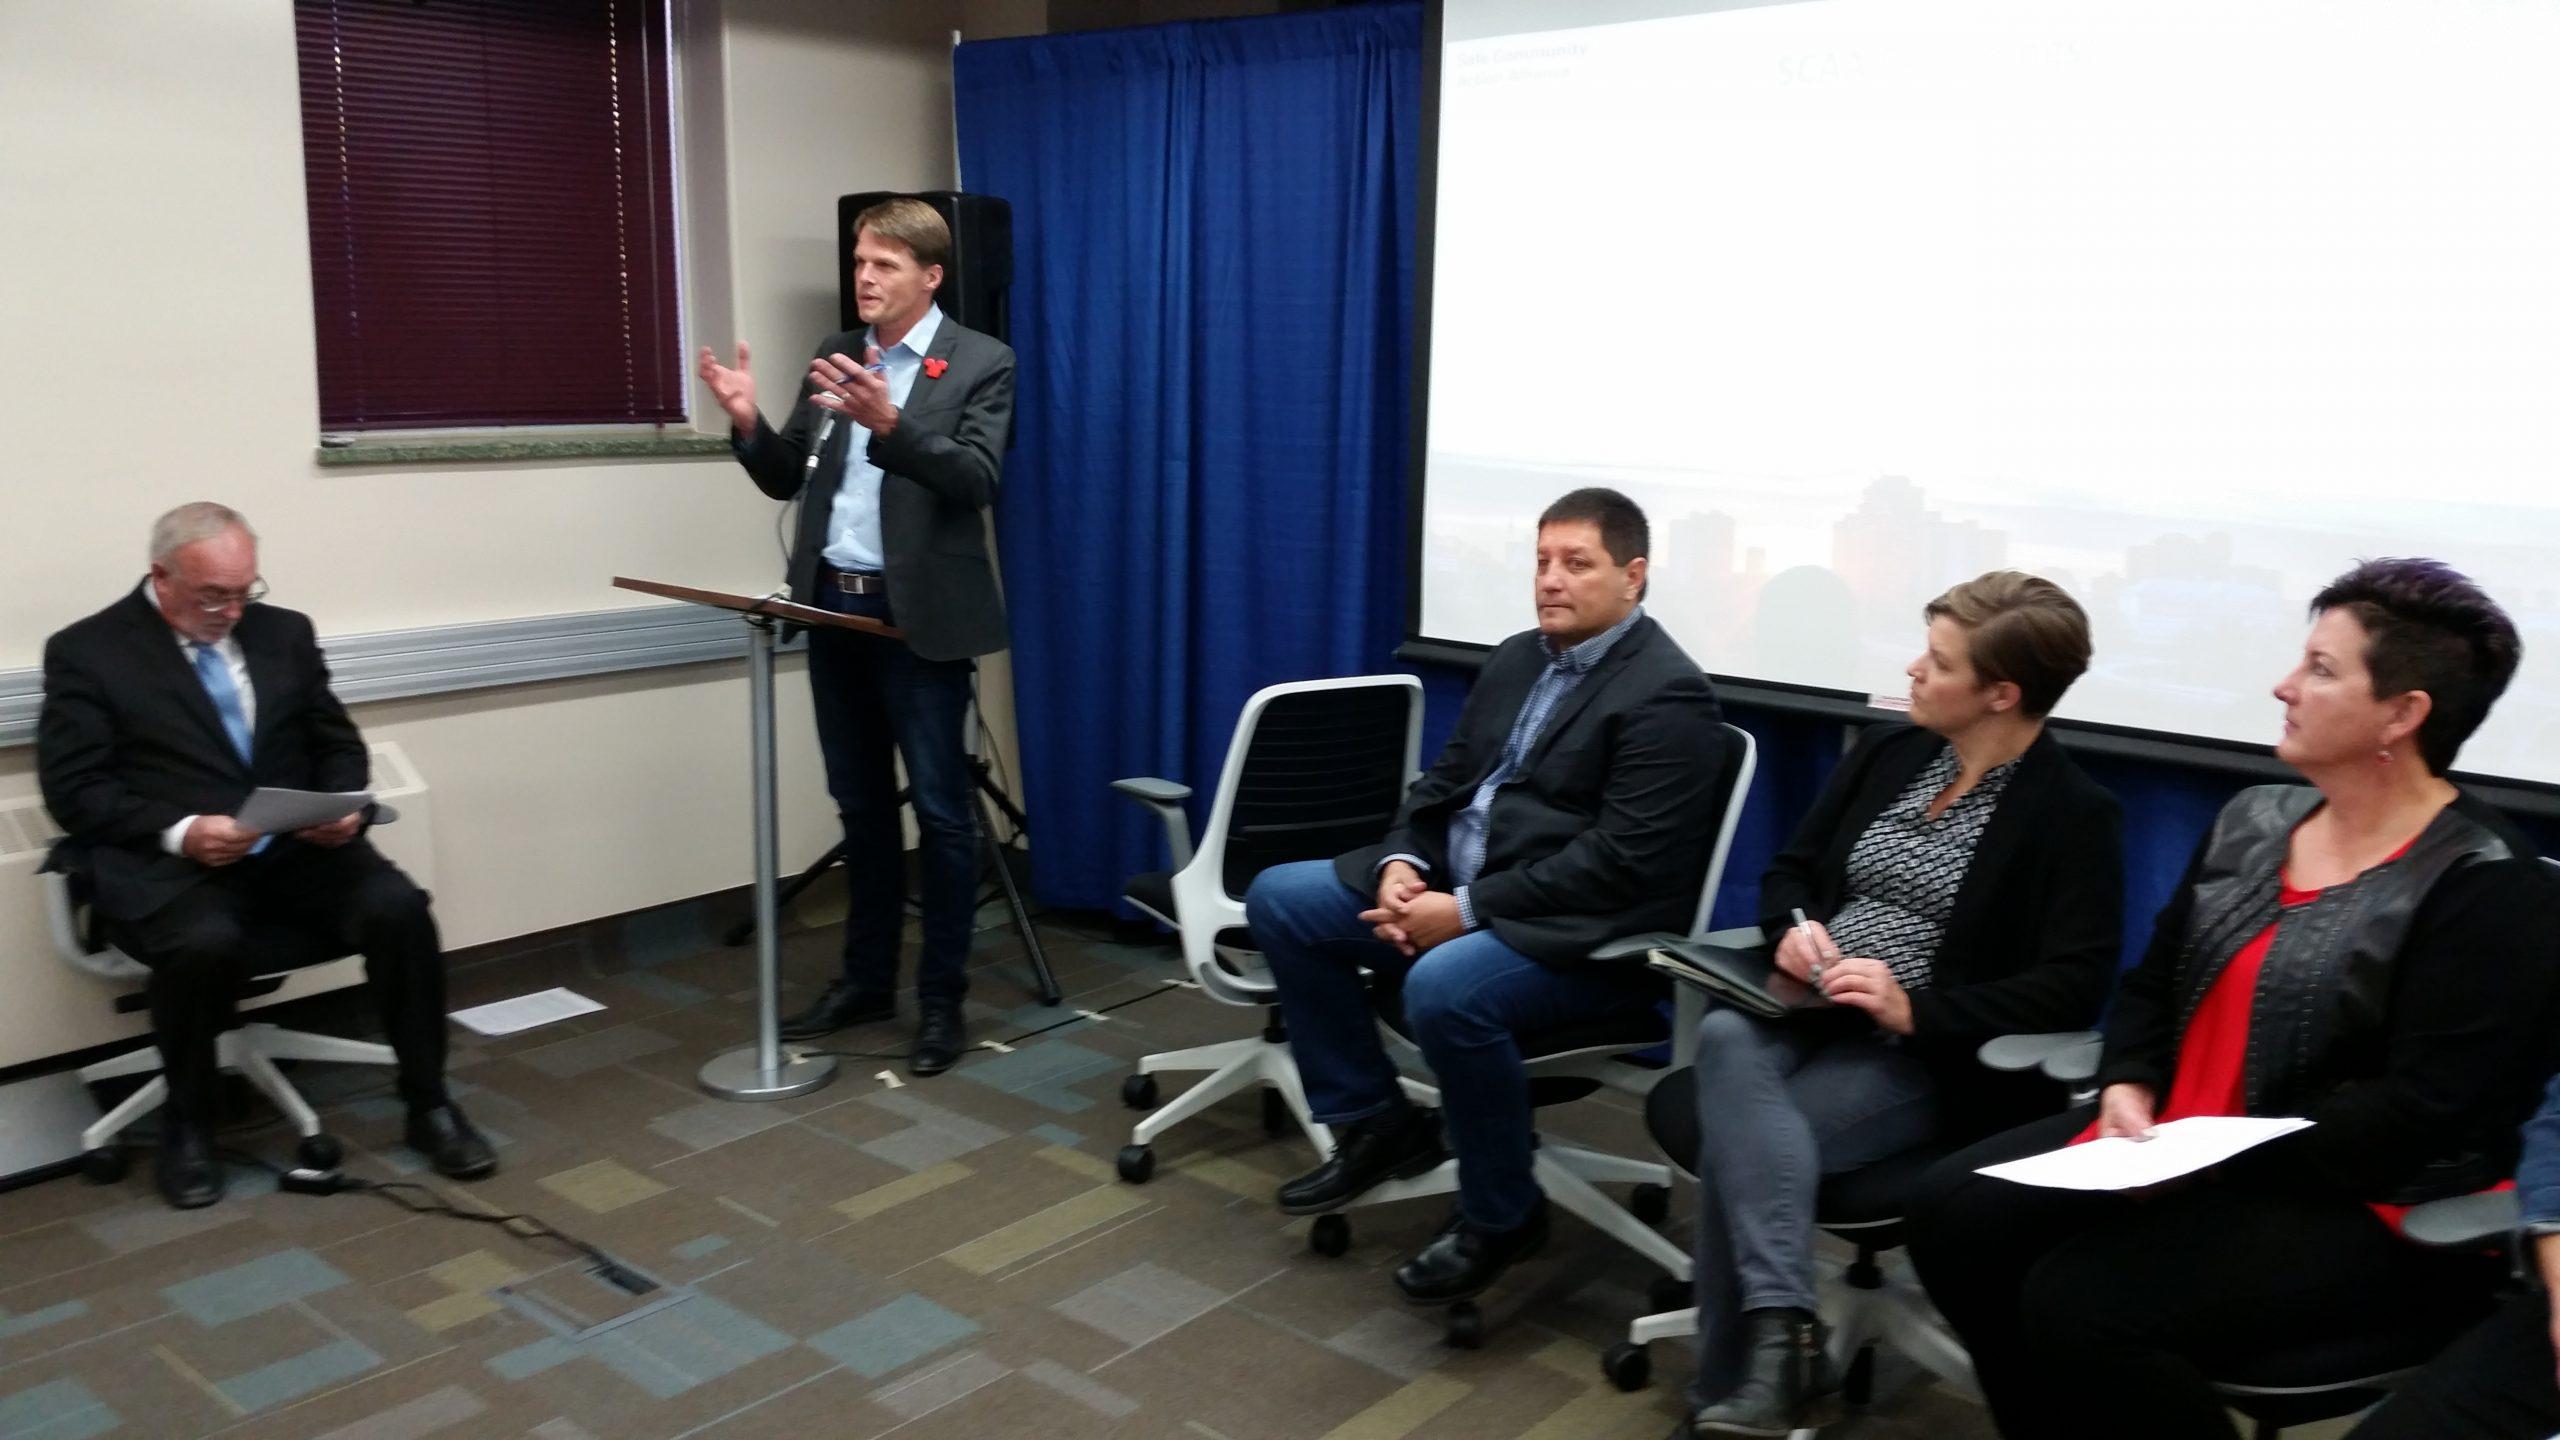 Crystal Meth and Homelessness Saskatoon's biggest problems